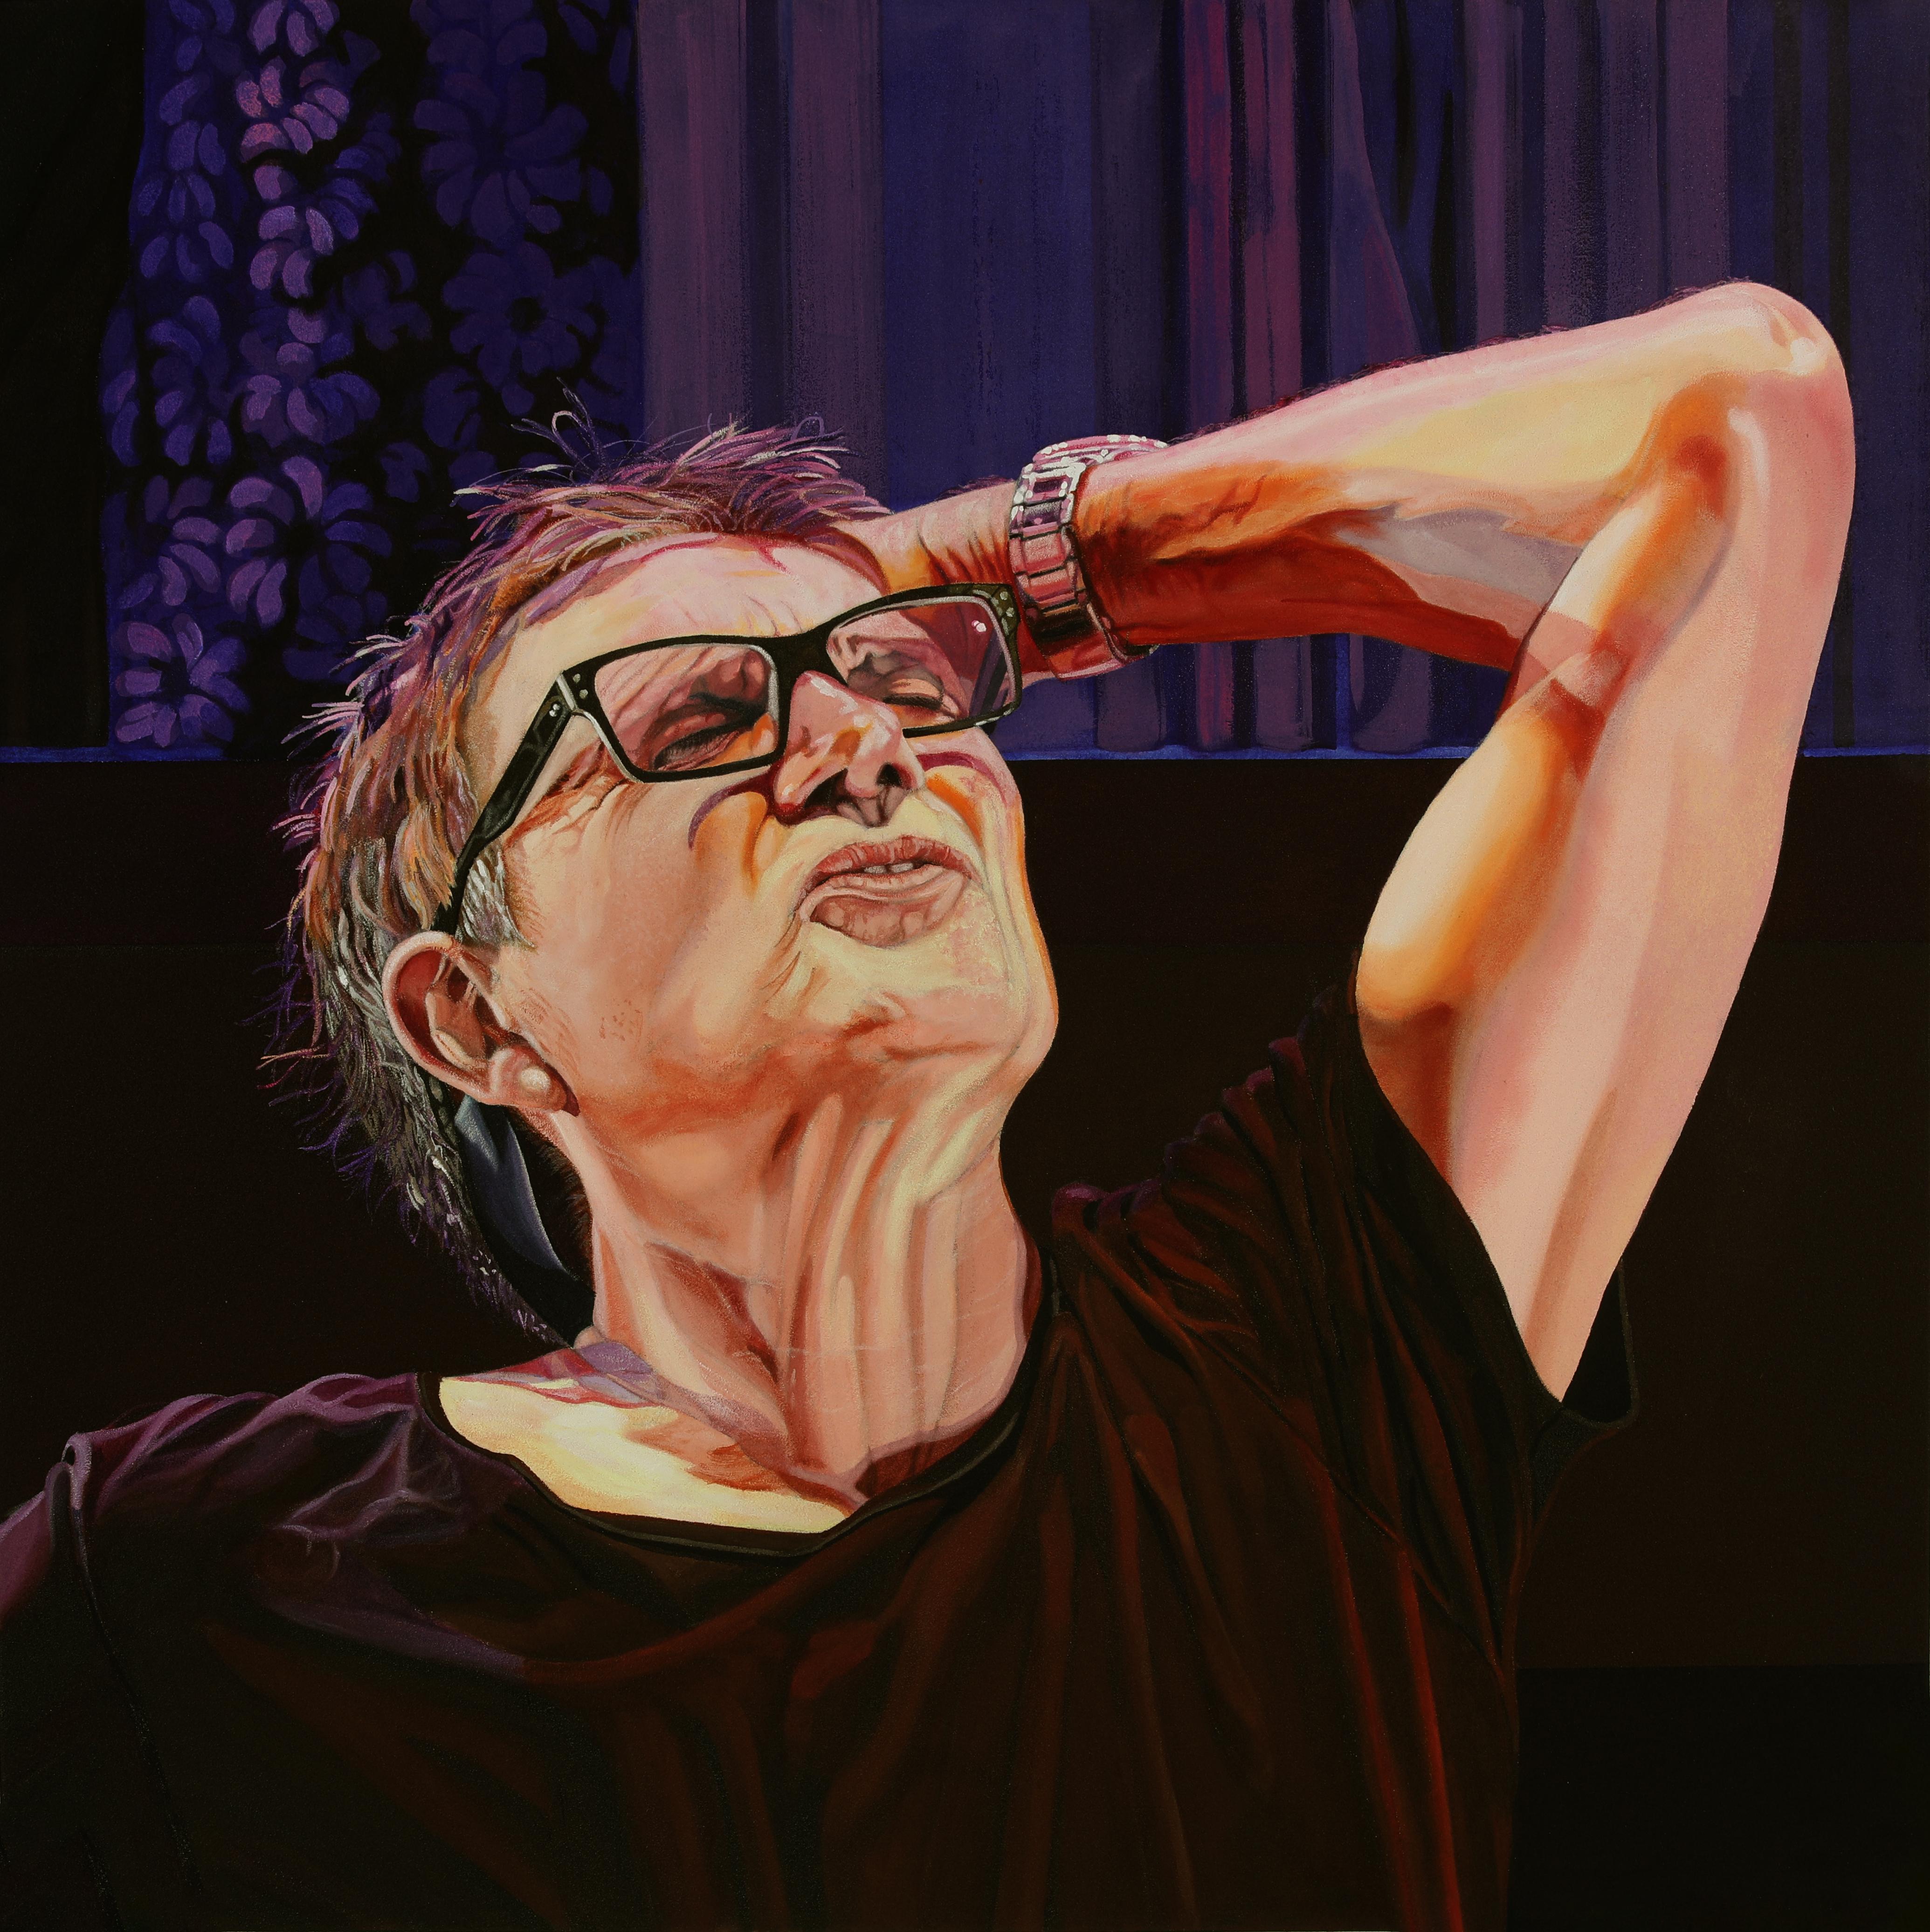 Peinture hyperréalisme Hervé Bernard : Avant la tempête